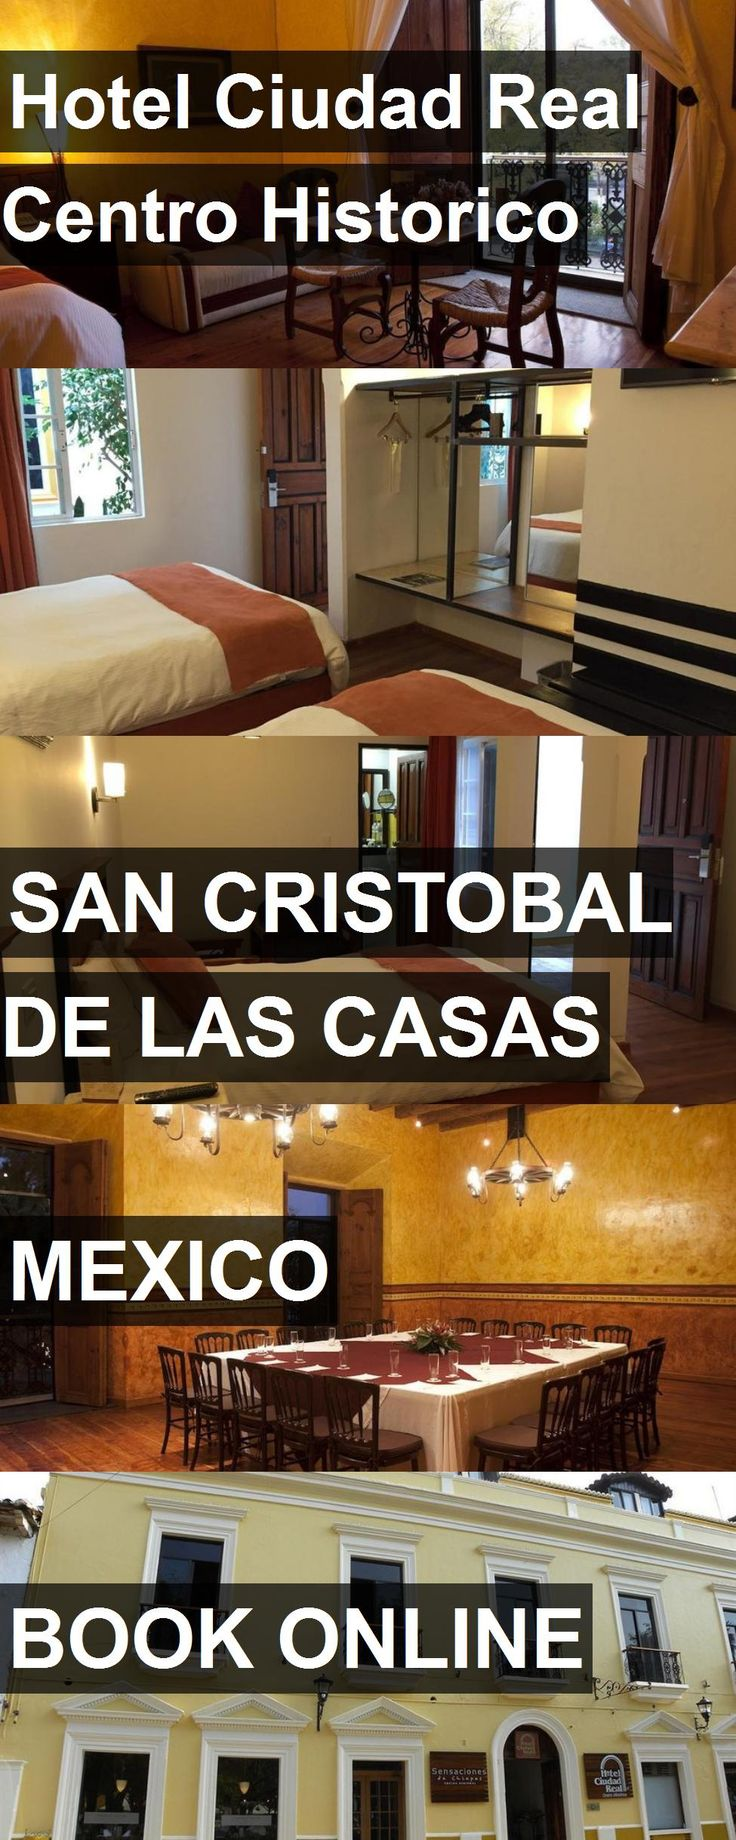 Hotel Ciudad Real Centro Historico in San Cristobal de las Casas, Mexico. For more information, photos, reviews and best prices please follow the link. #Mexico #SanCristobaldelasCasas #travel #vacation #hotel